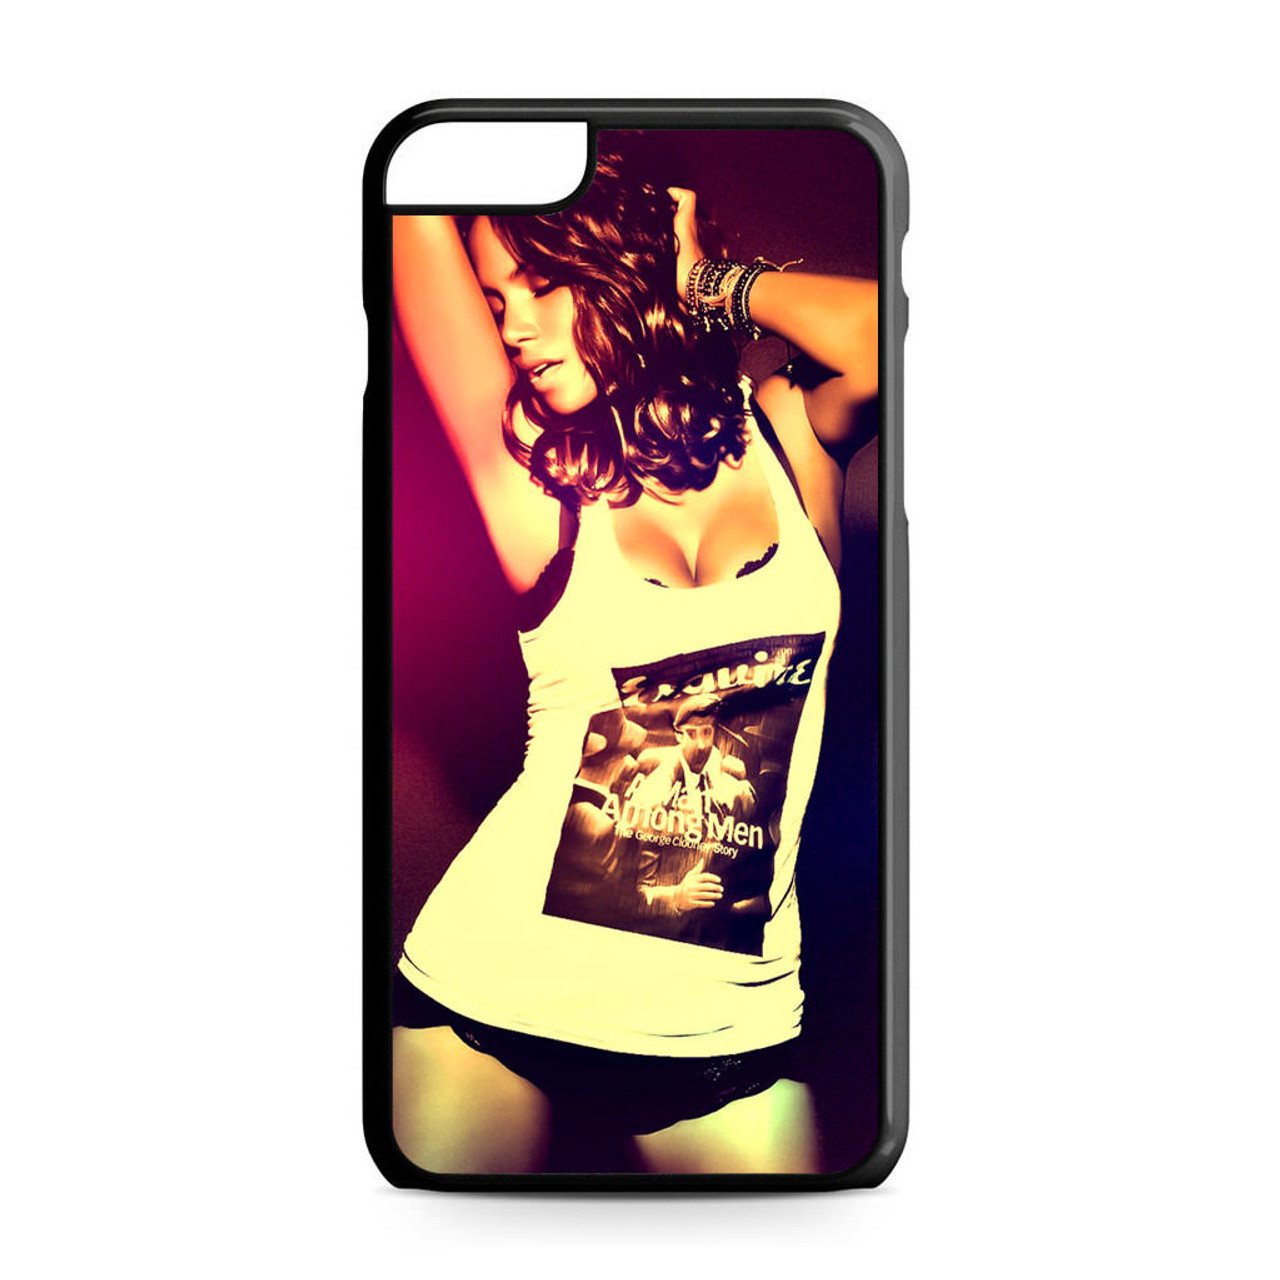 iphone 6s case berry